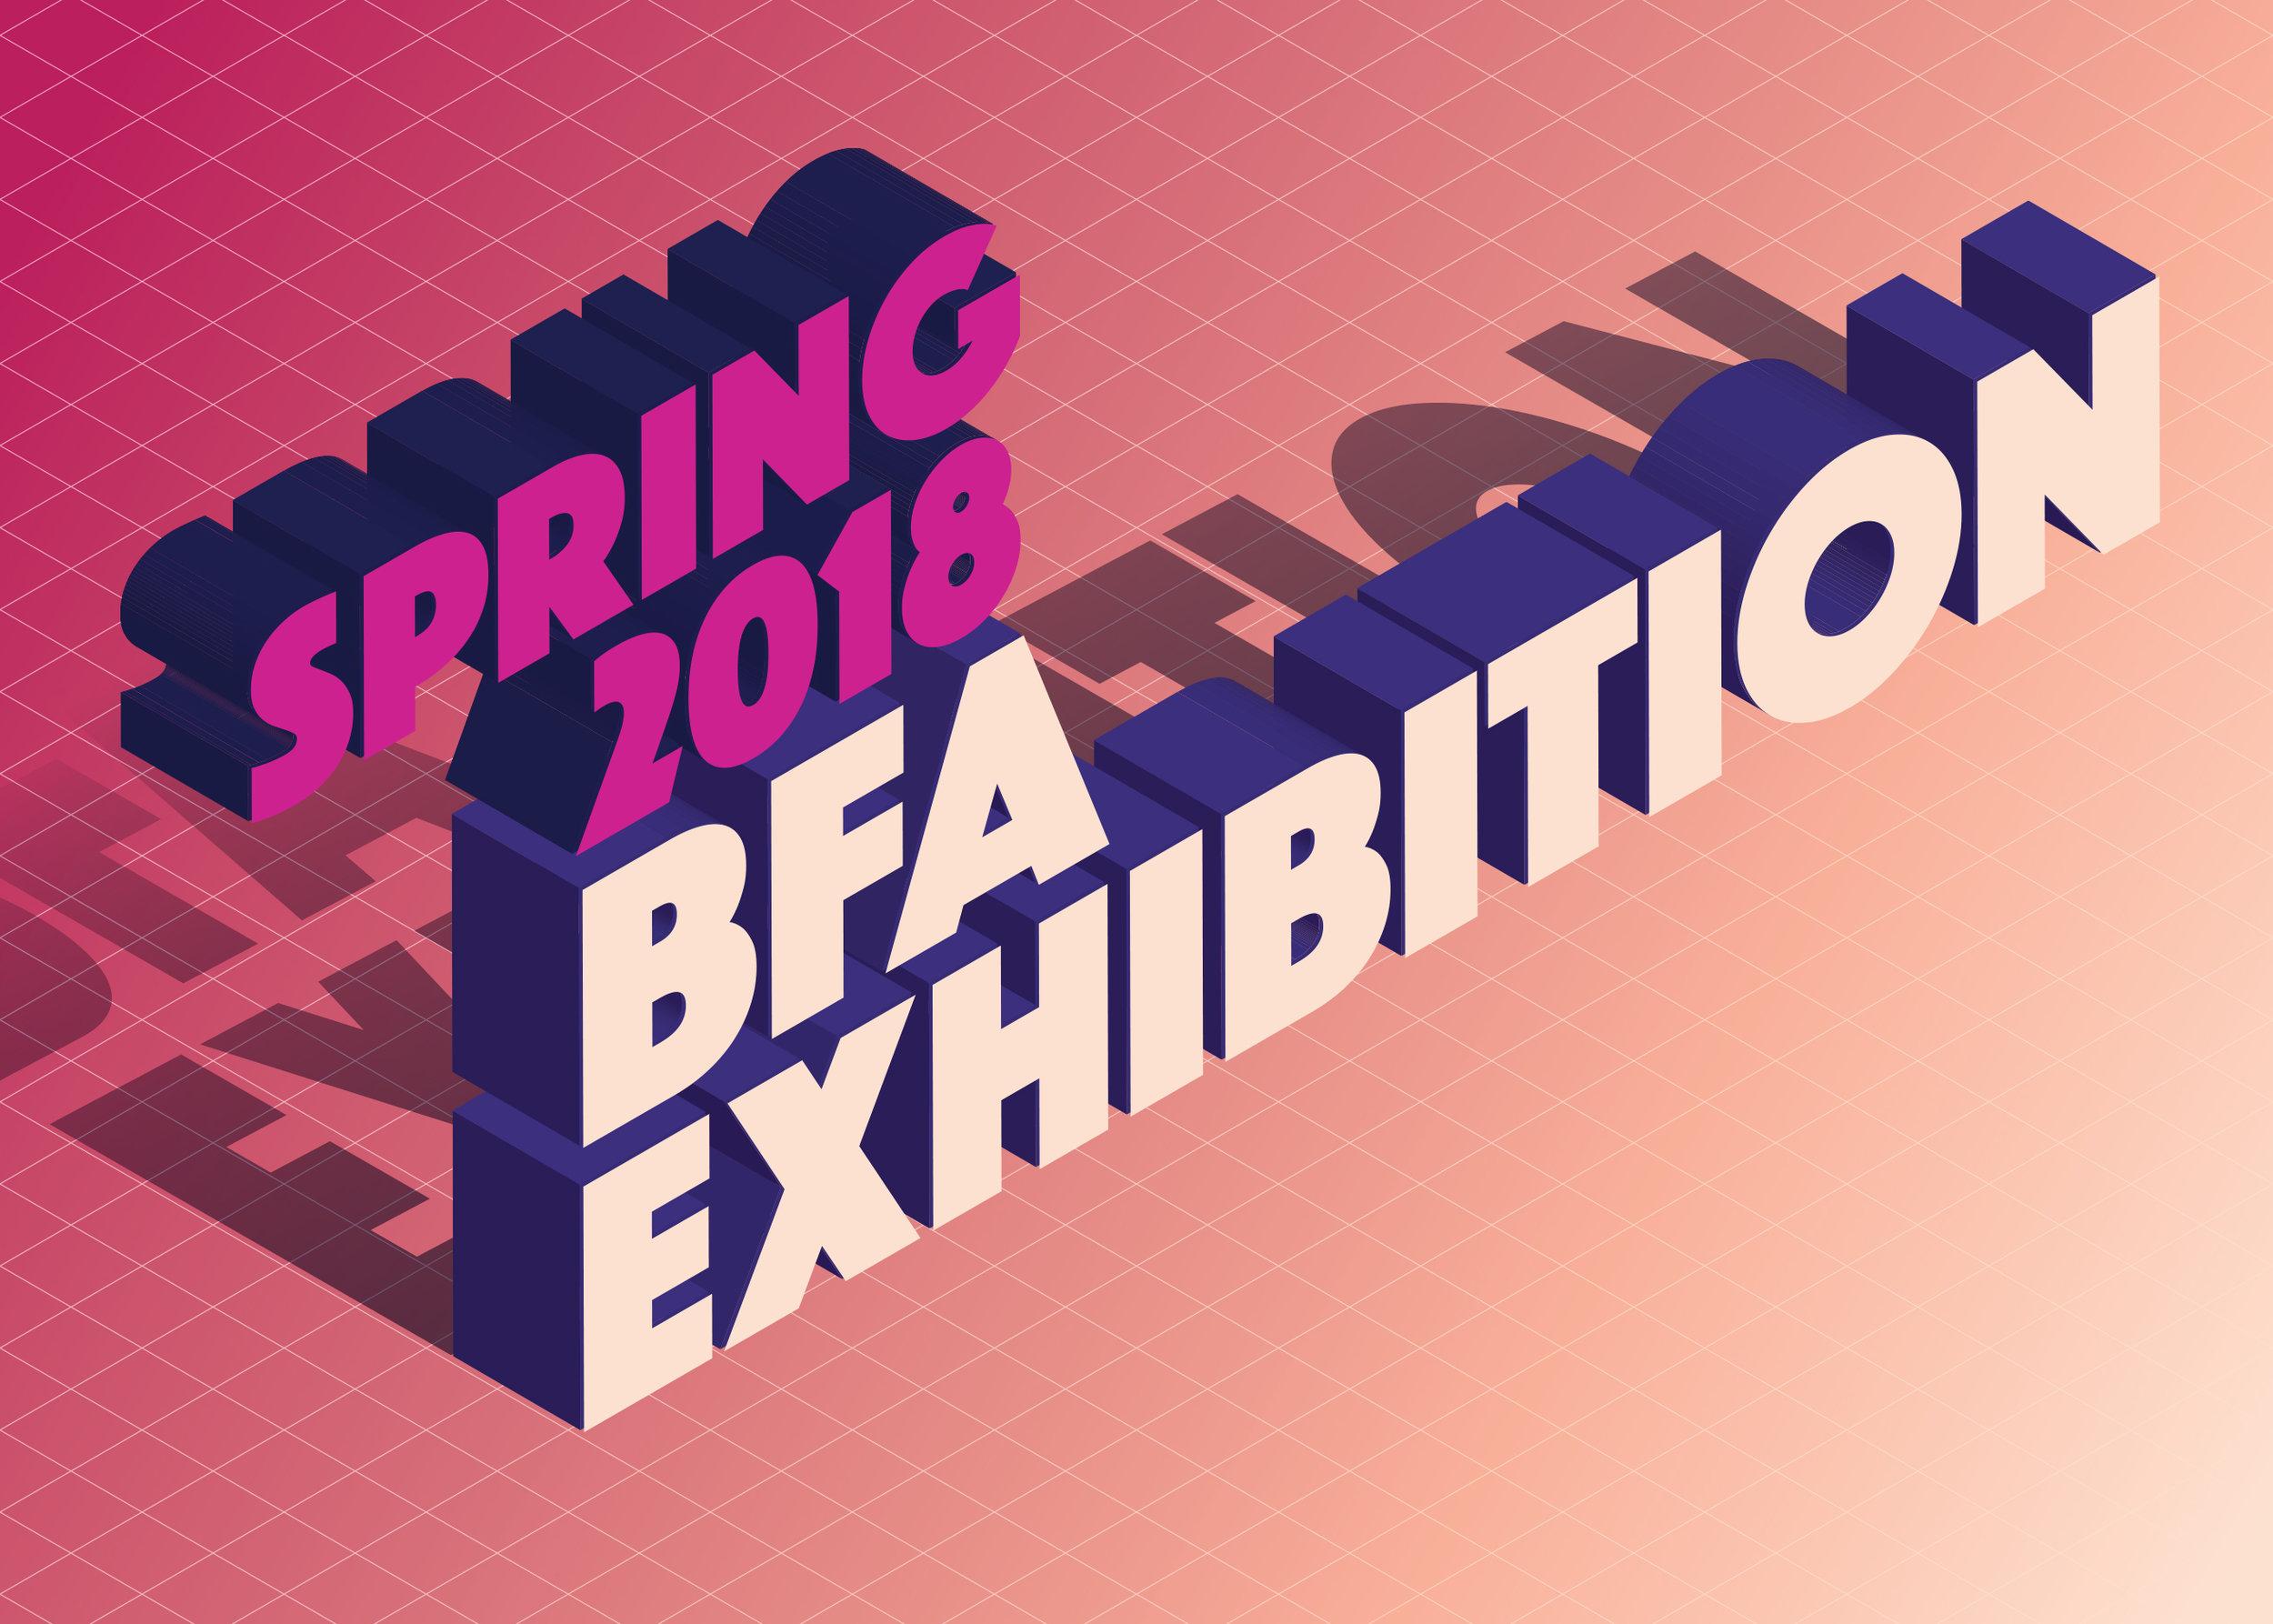 bfa exhibition postcard options-4.jpg